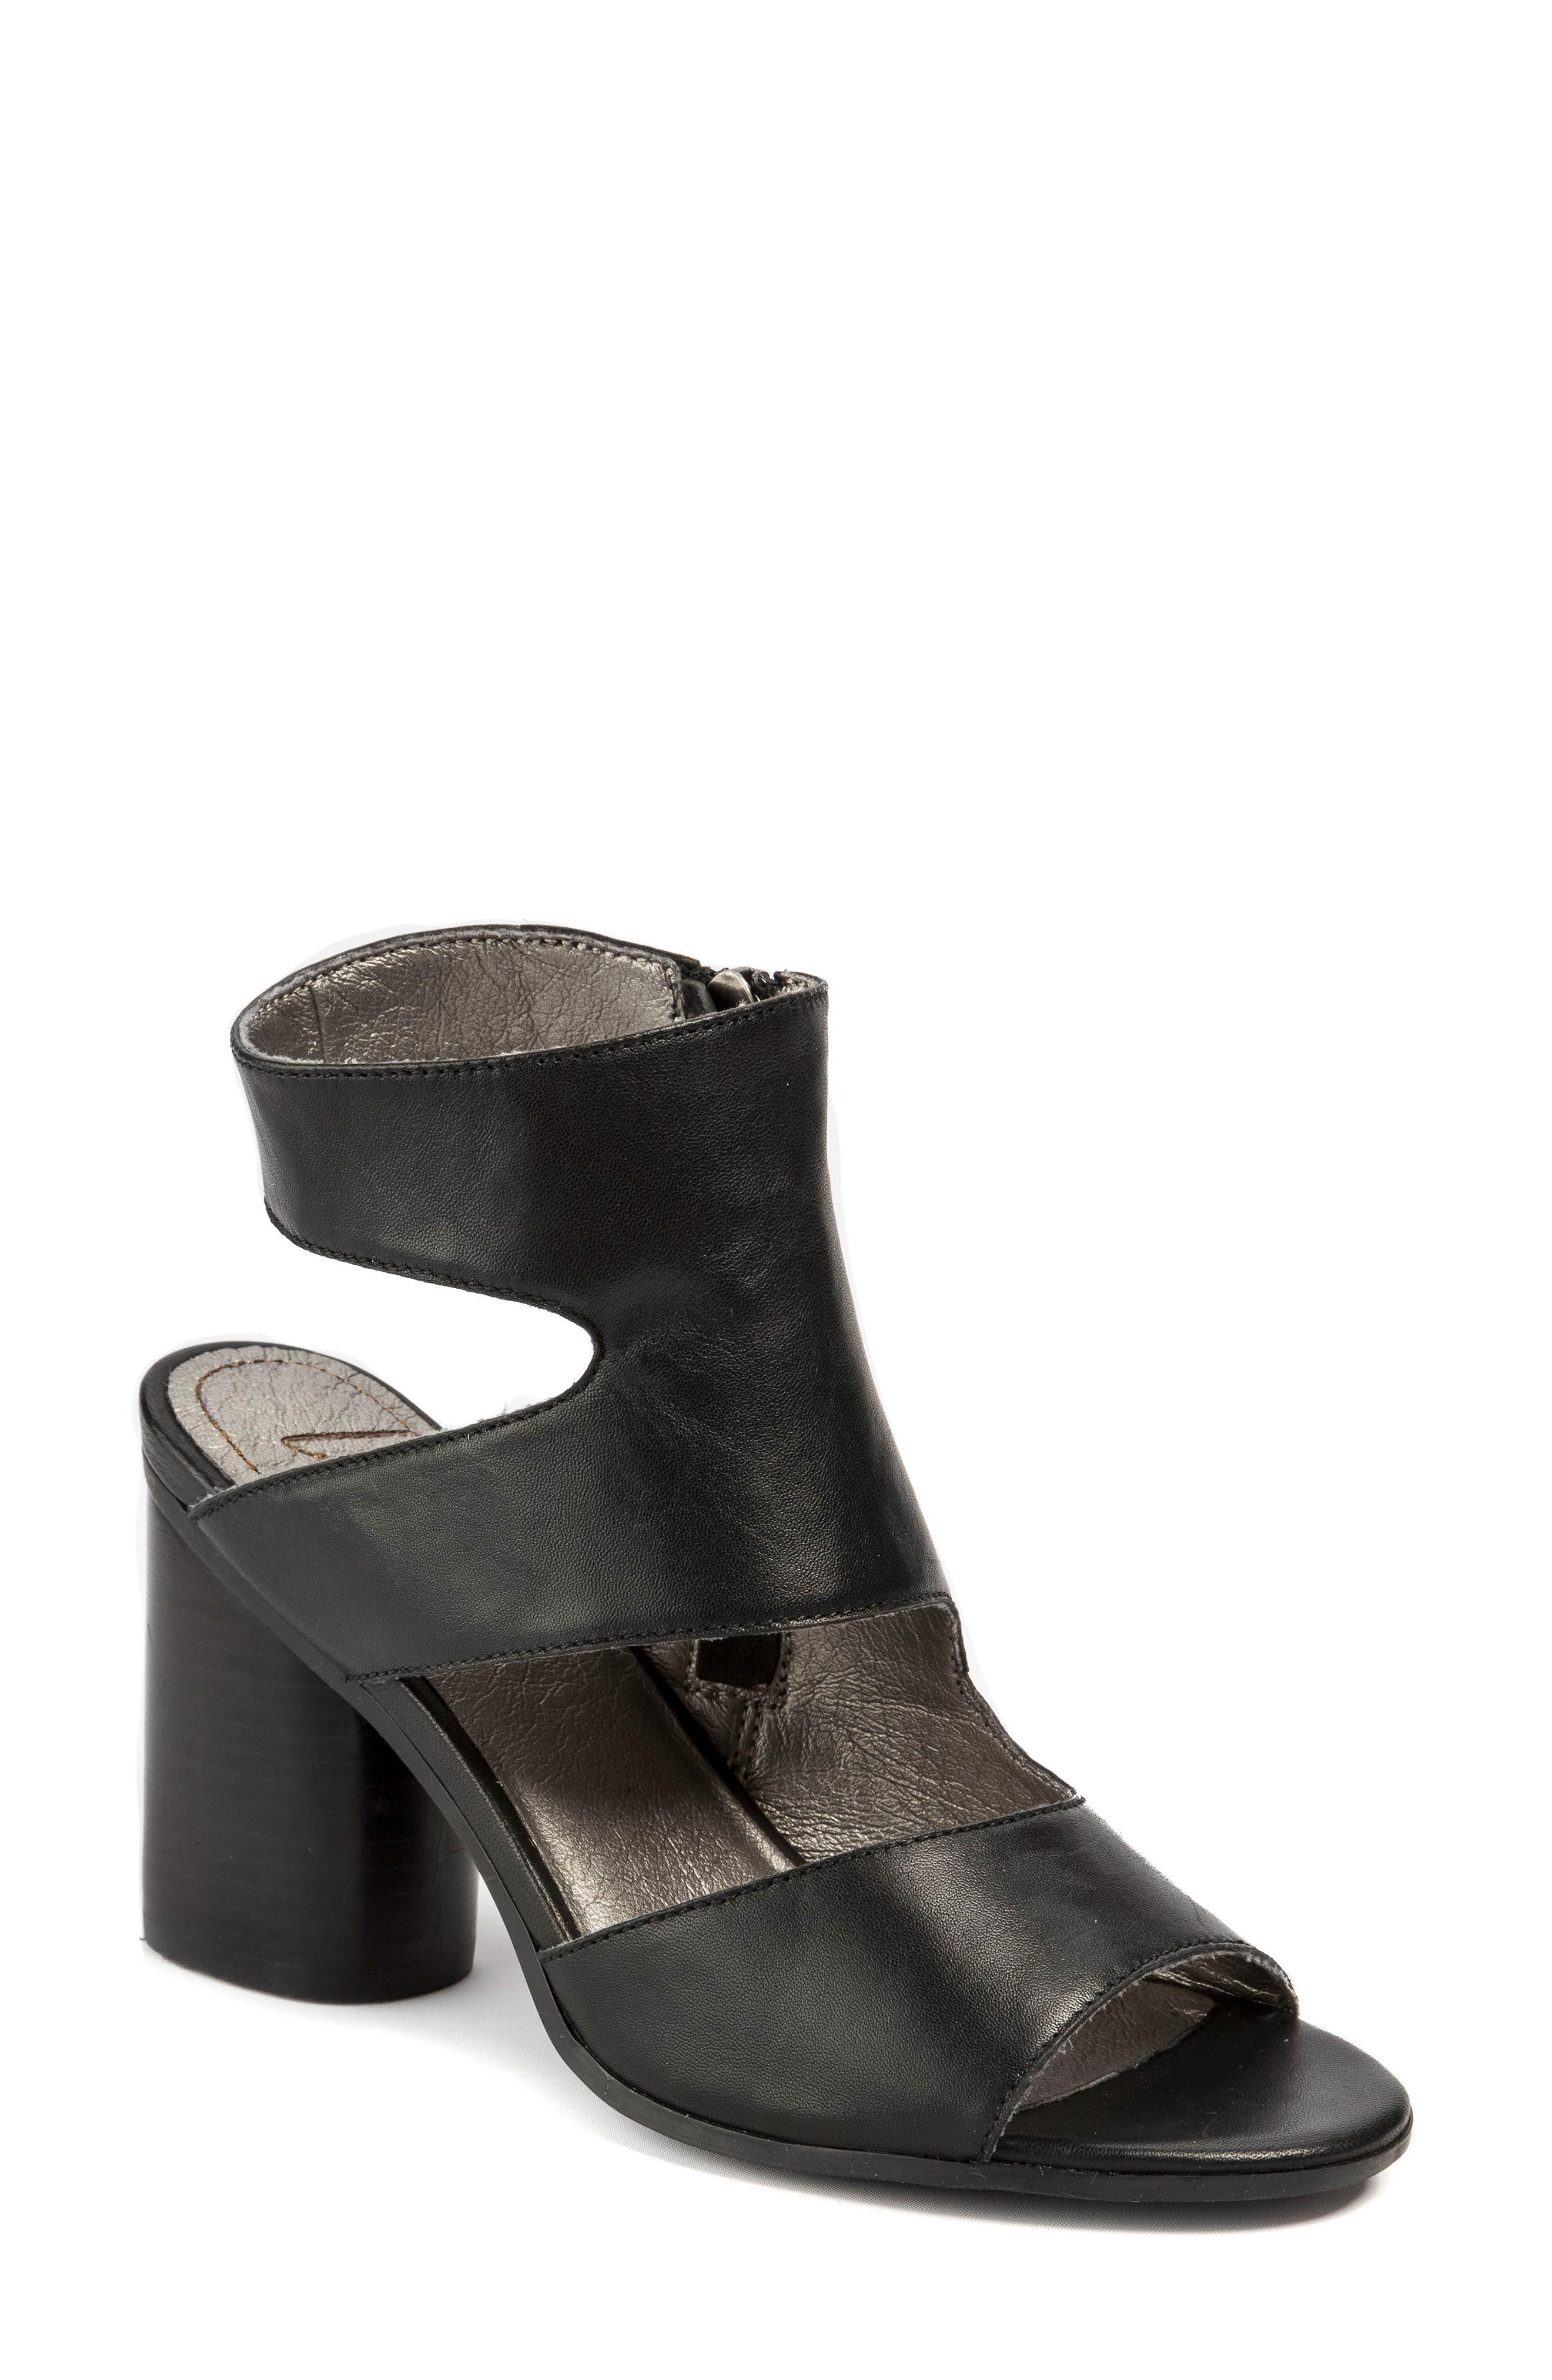 Hadie Asymmetrical Tall Sandal,                             Main thumbnail 1, color,                             Black Leather